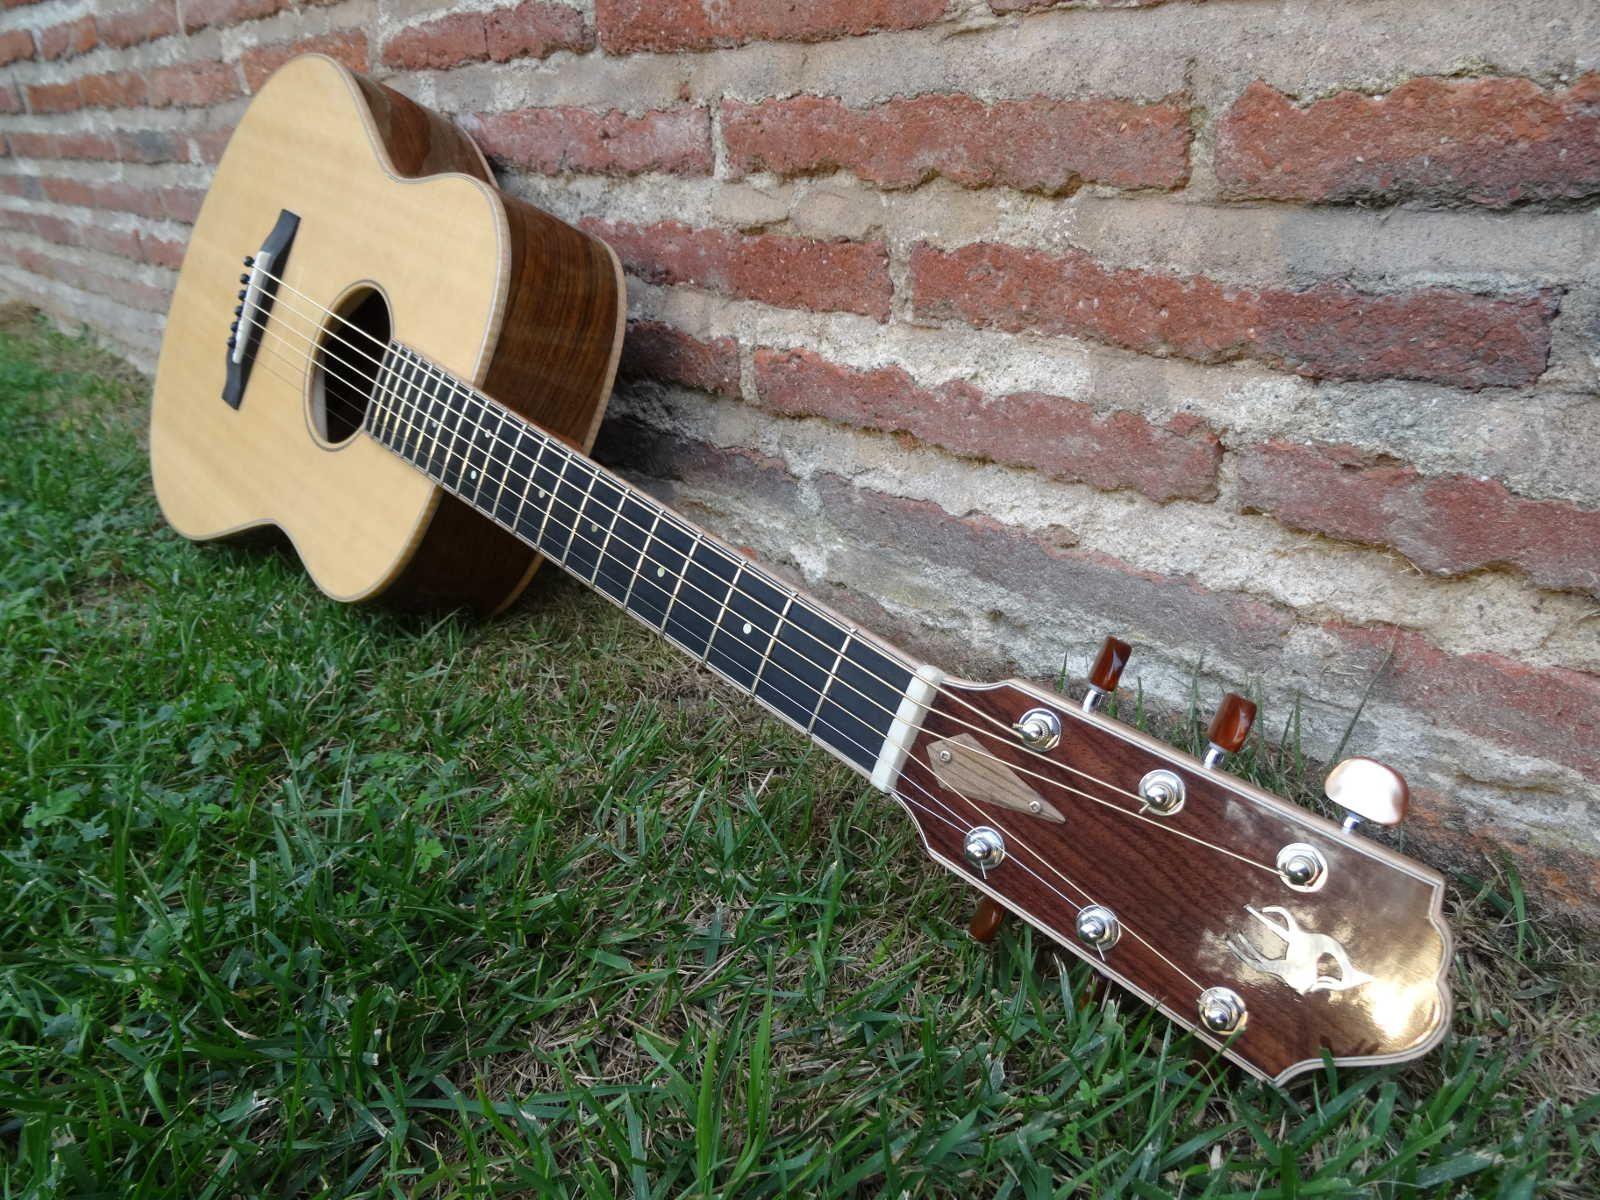 Guitare de voyage / Travel Guitar Mélopée - Impala